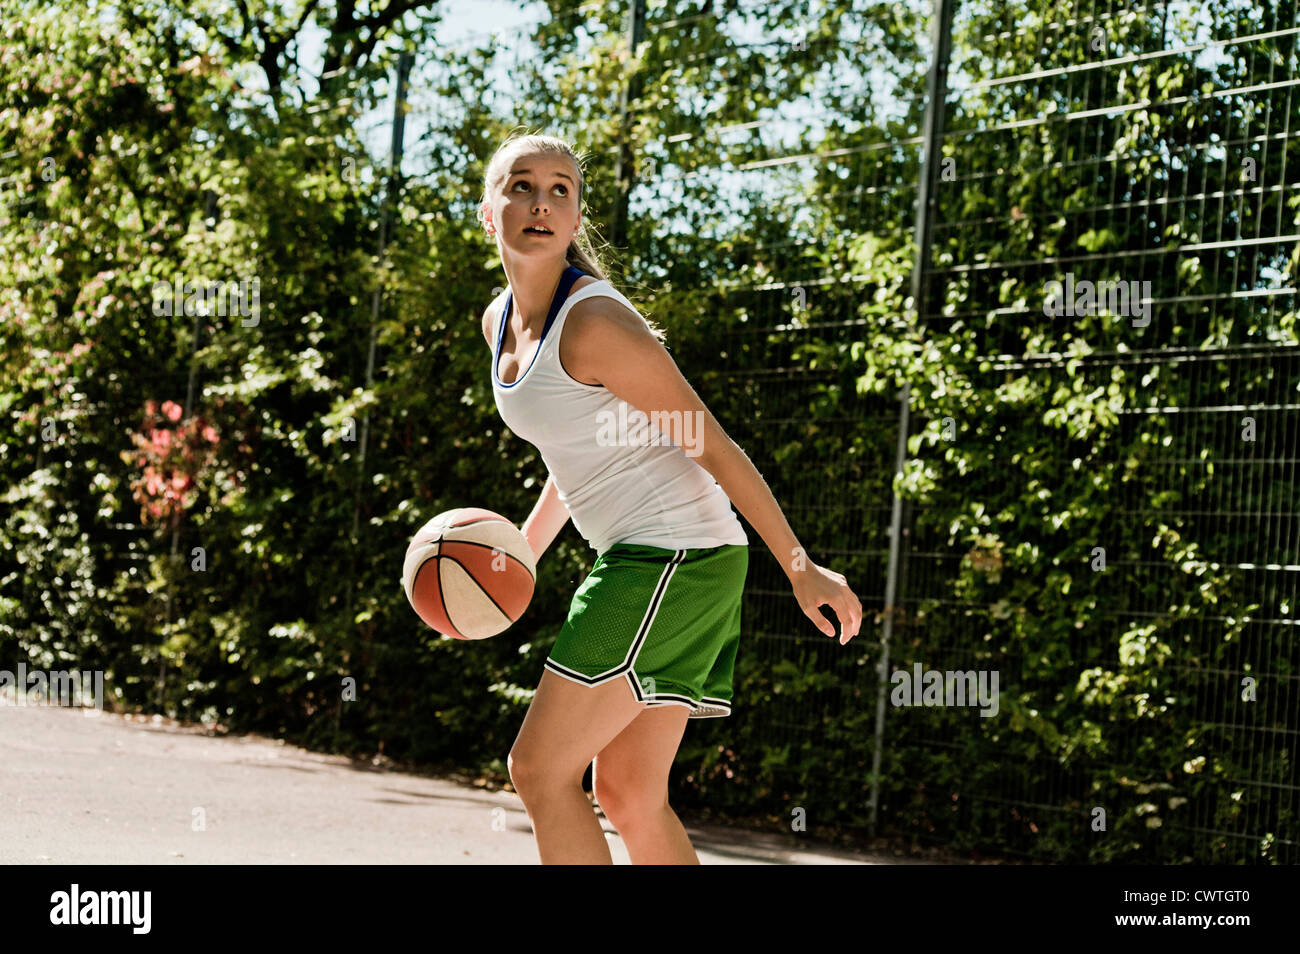 Teenage girl playing basketball Photo Stock